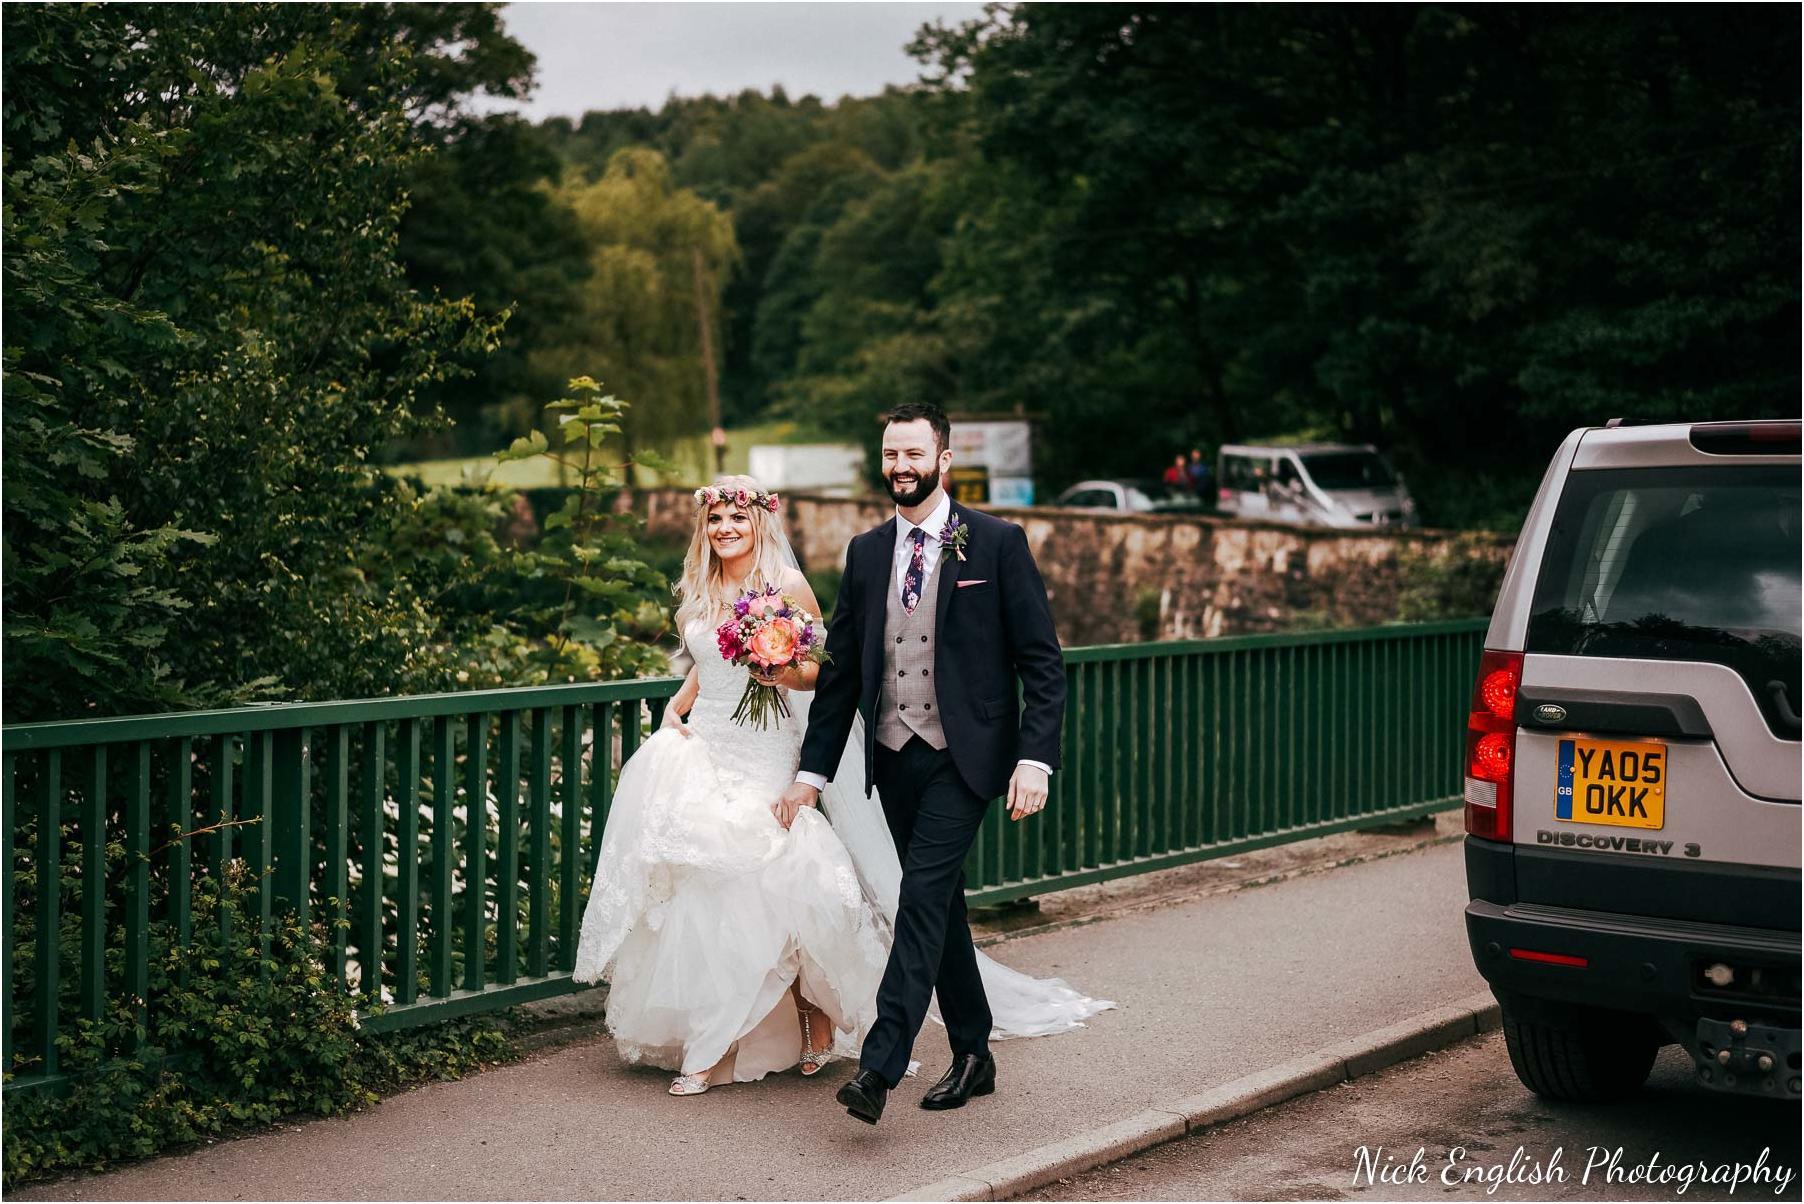 Whitebottom_Farm_Wedding_Manchester_Photograph-38.jpg